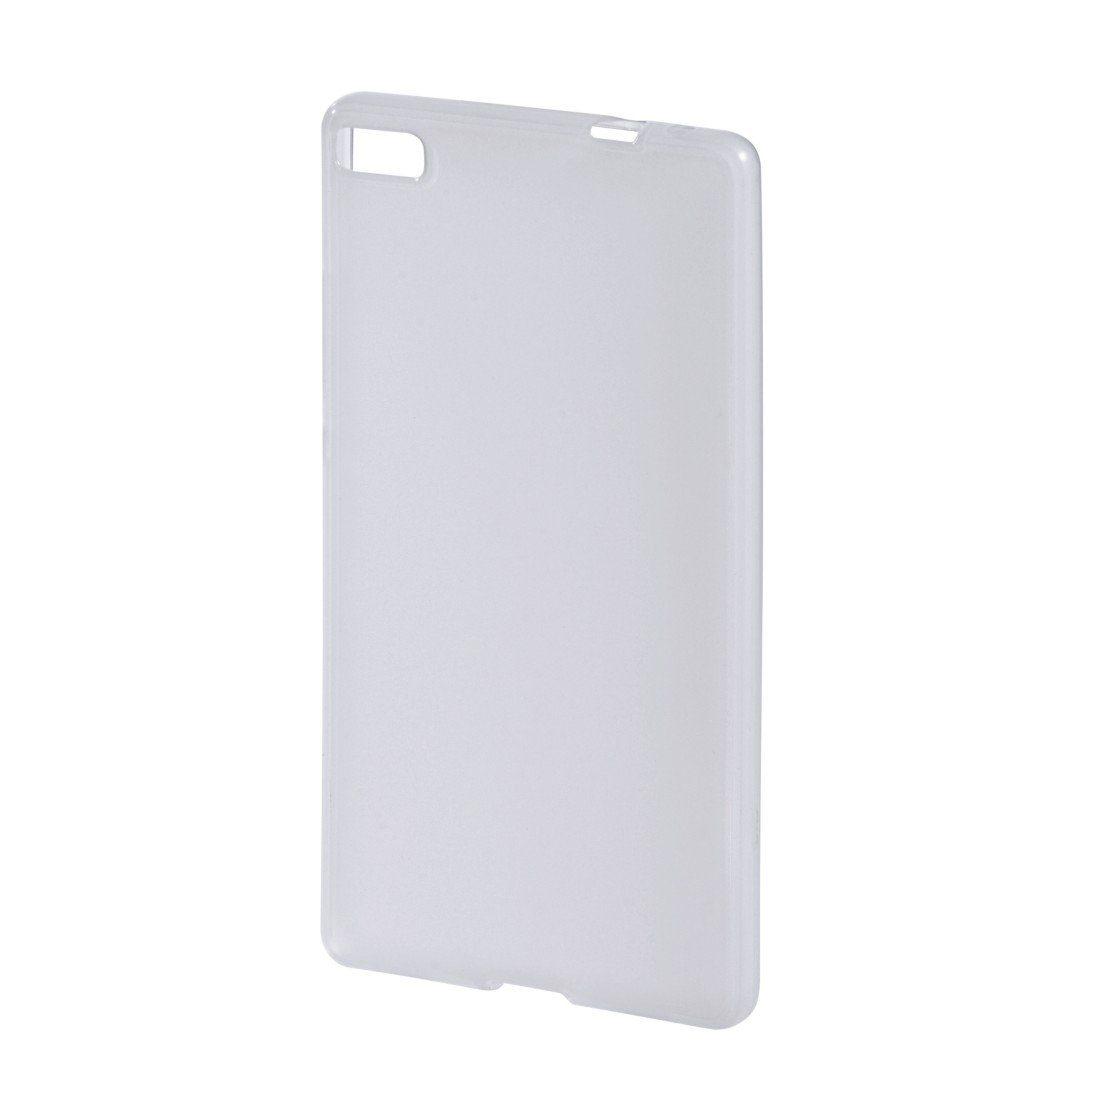 Hama Cover Crystal für Huawei P8, Transparent